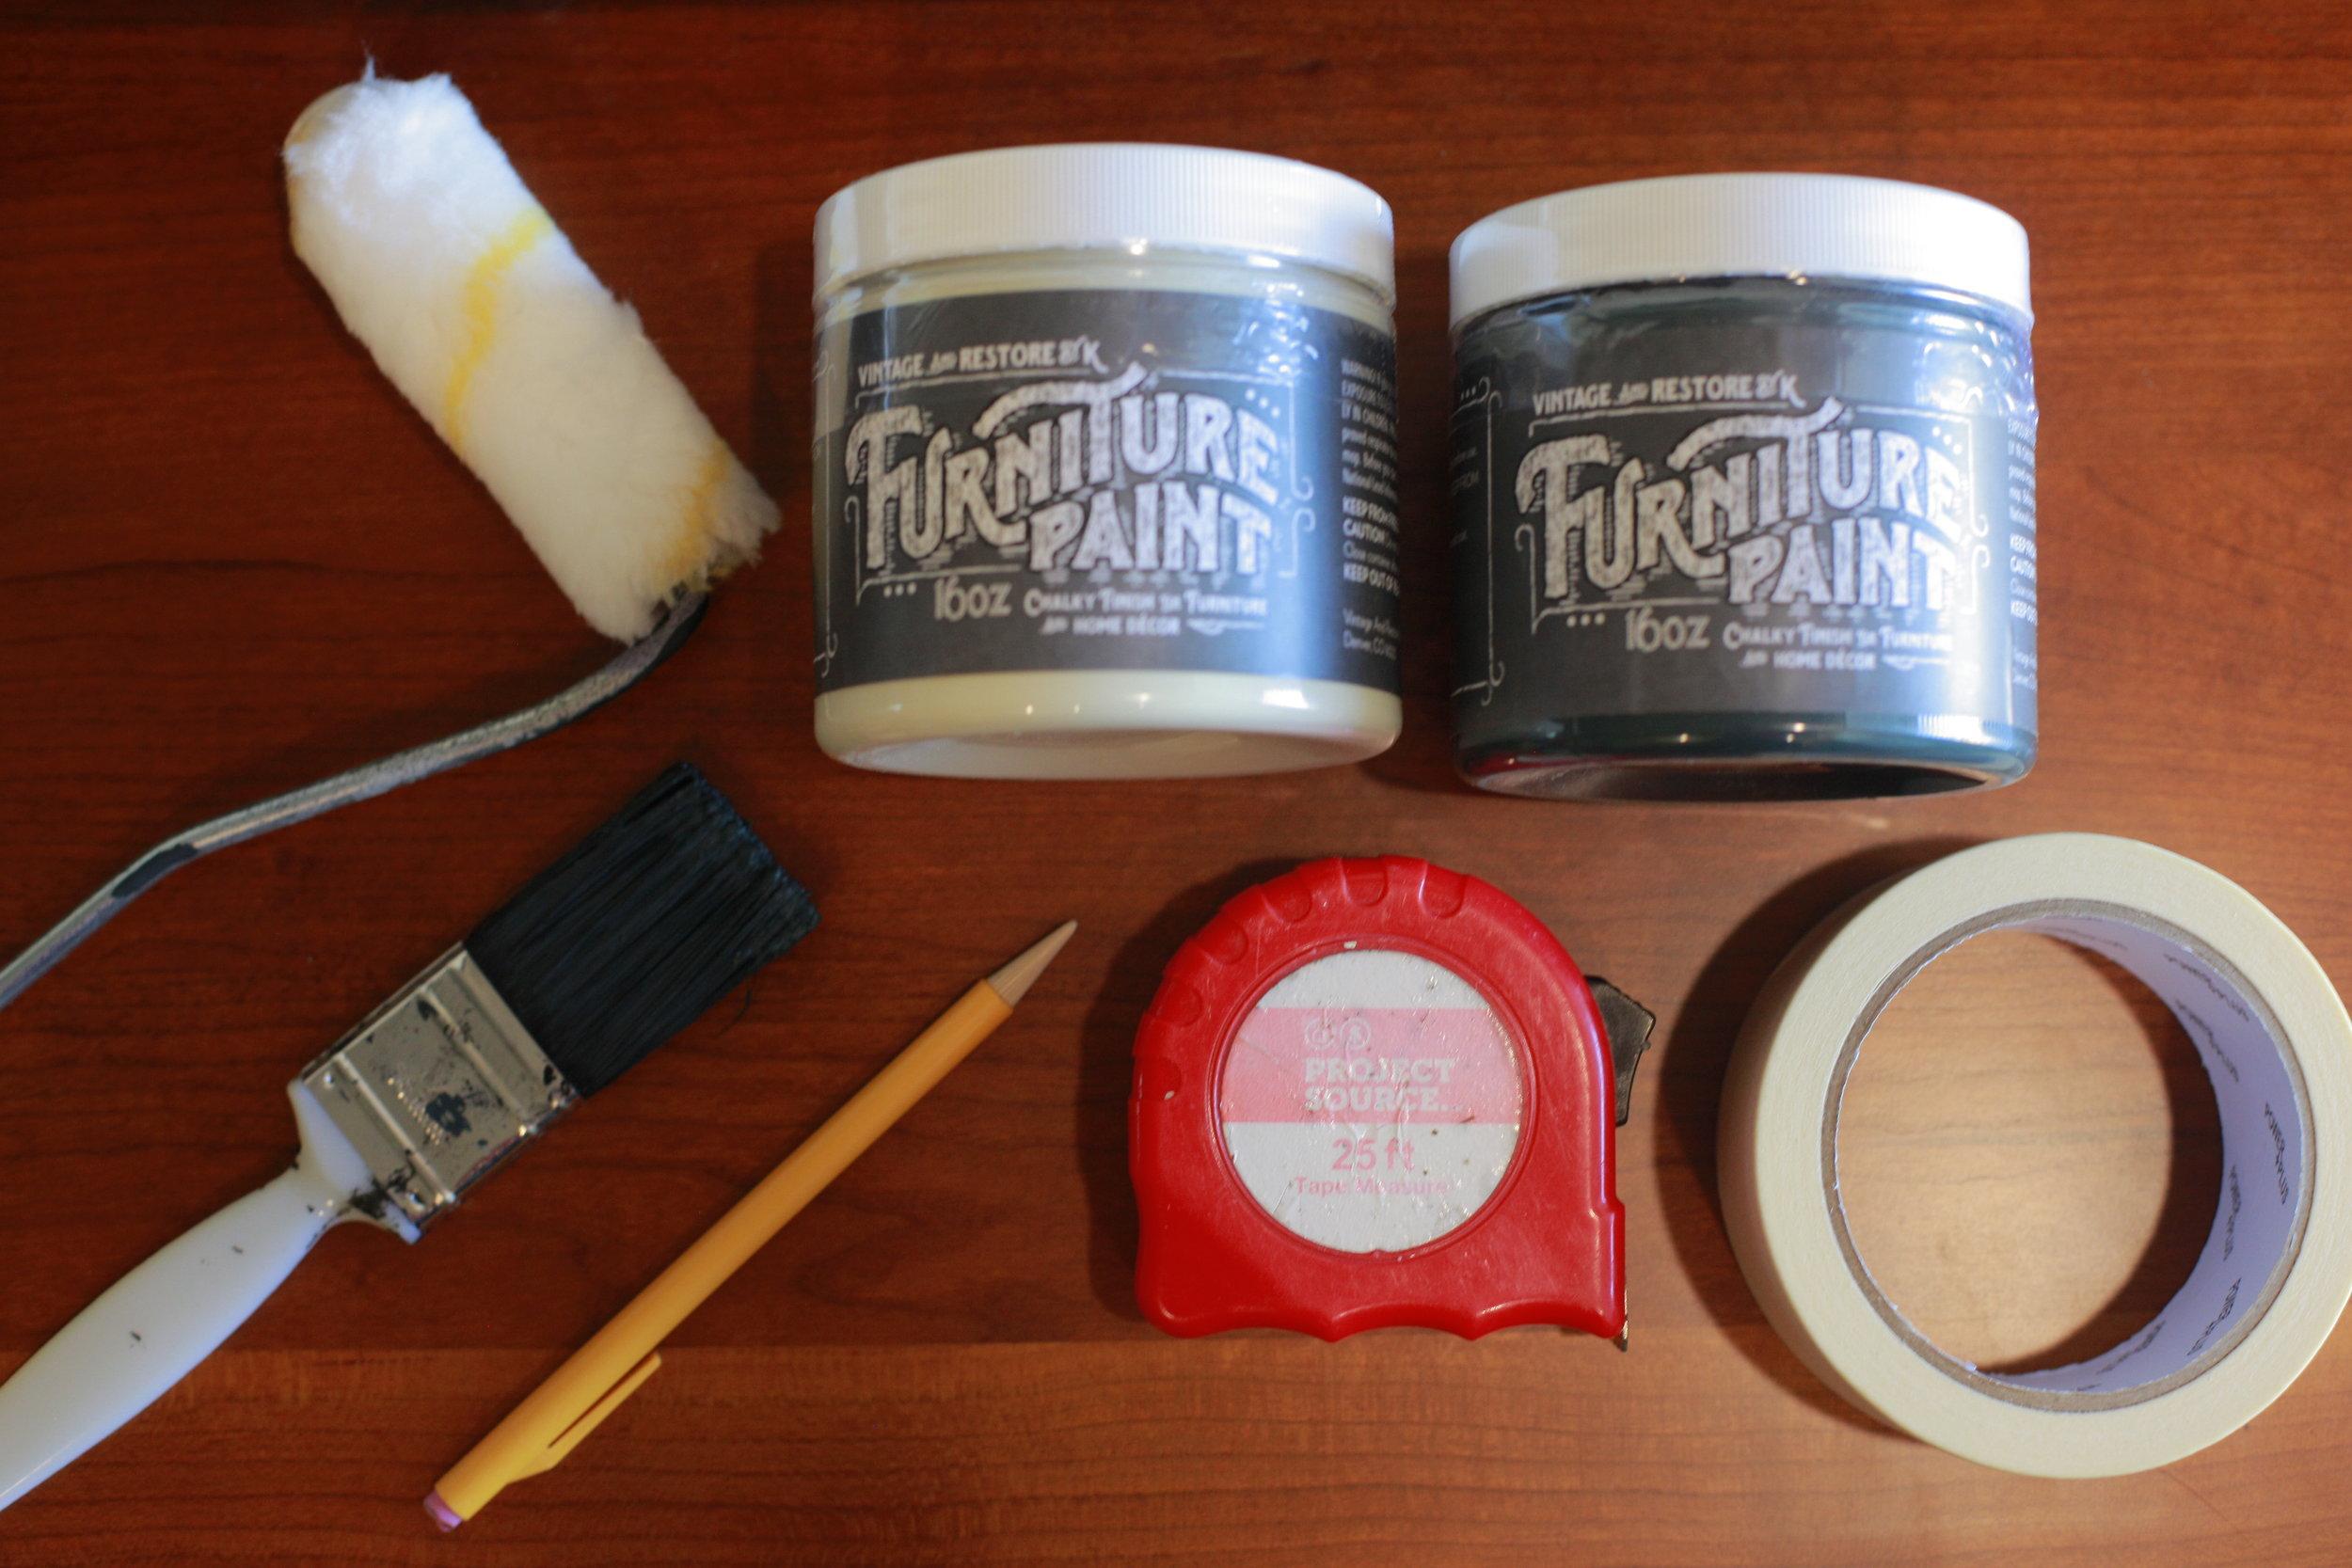 SUPPLIES:   - Paint (color: Almond Biscotti, Noir)  - Roller or Paint brush  - Pencil  - Measuring tape  - Painters tape